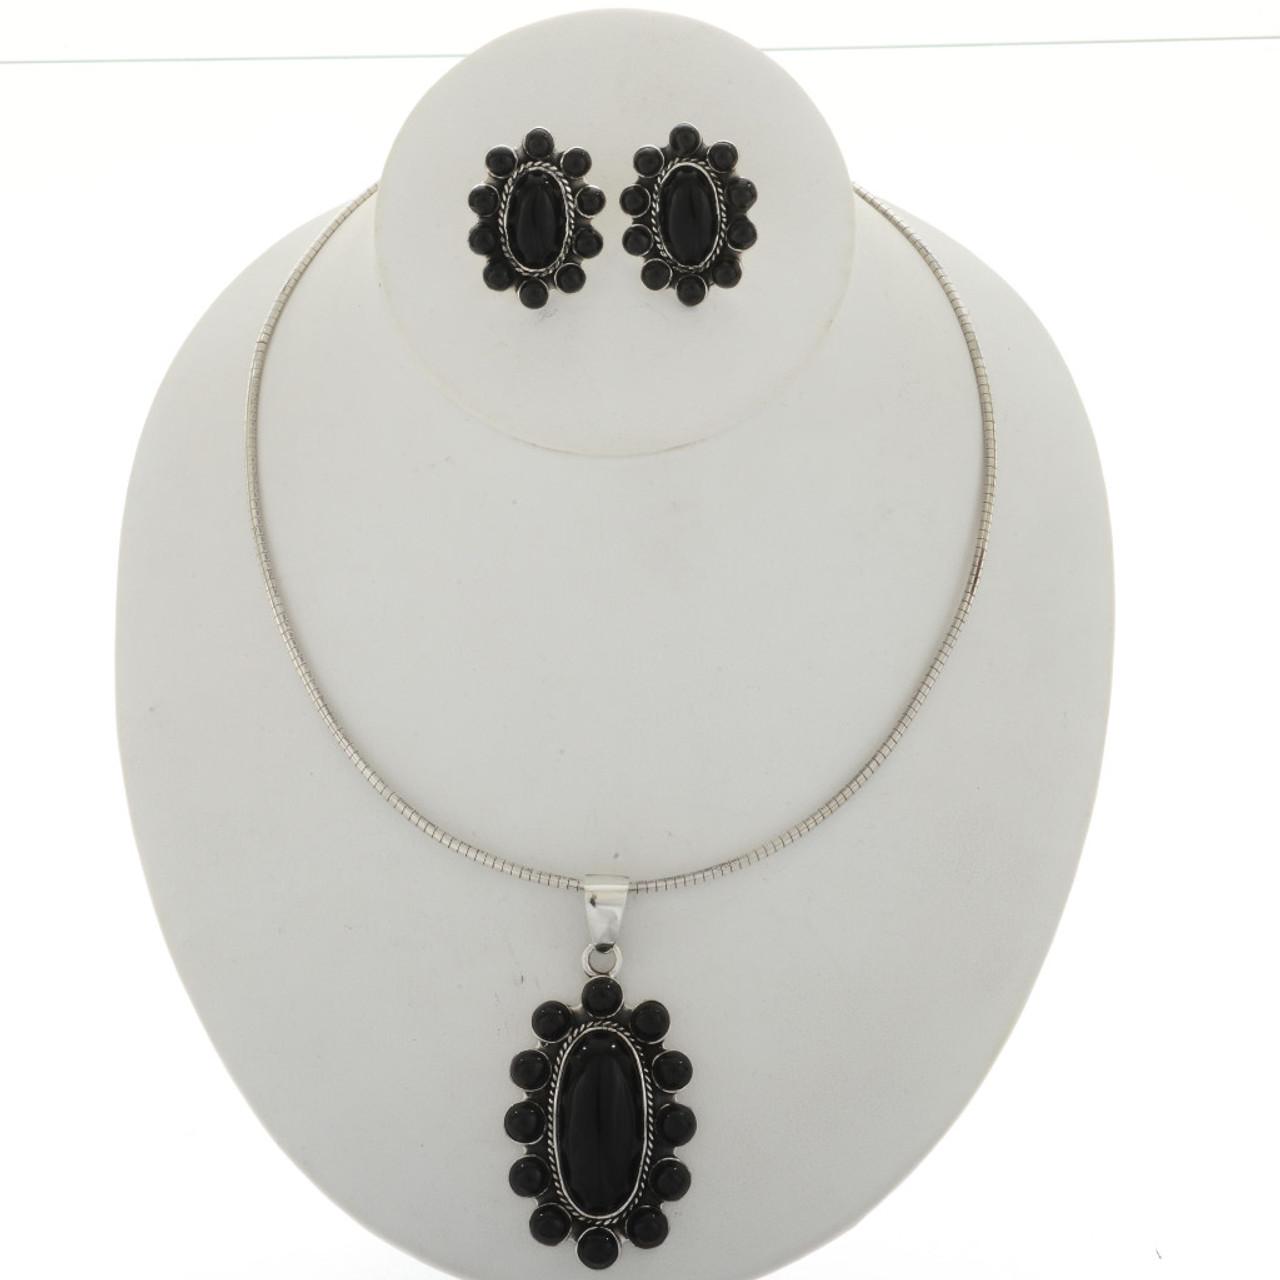 Black onyx silver cluster pendant necklace 2023 black onyx silver cluster pendant necklace2023 aloadofball Images